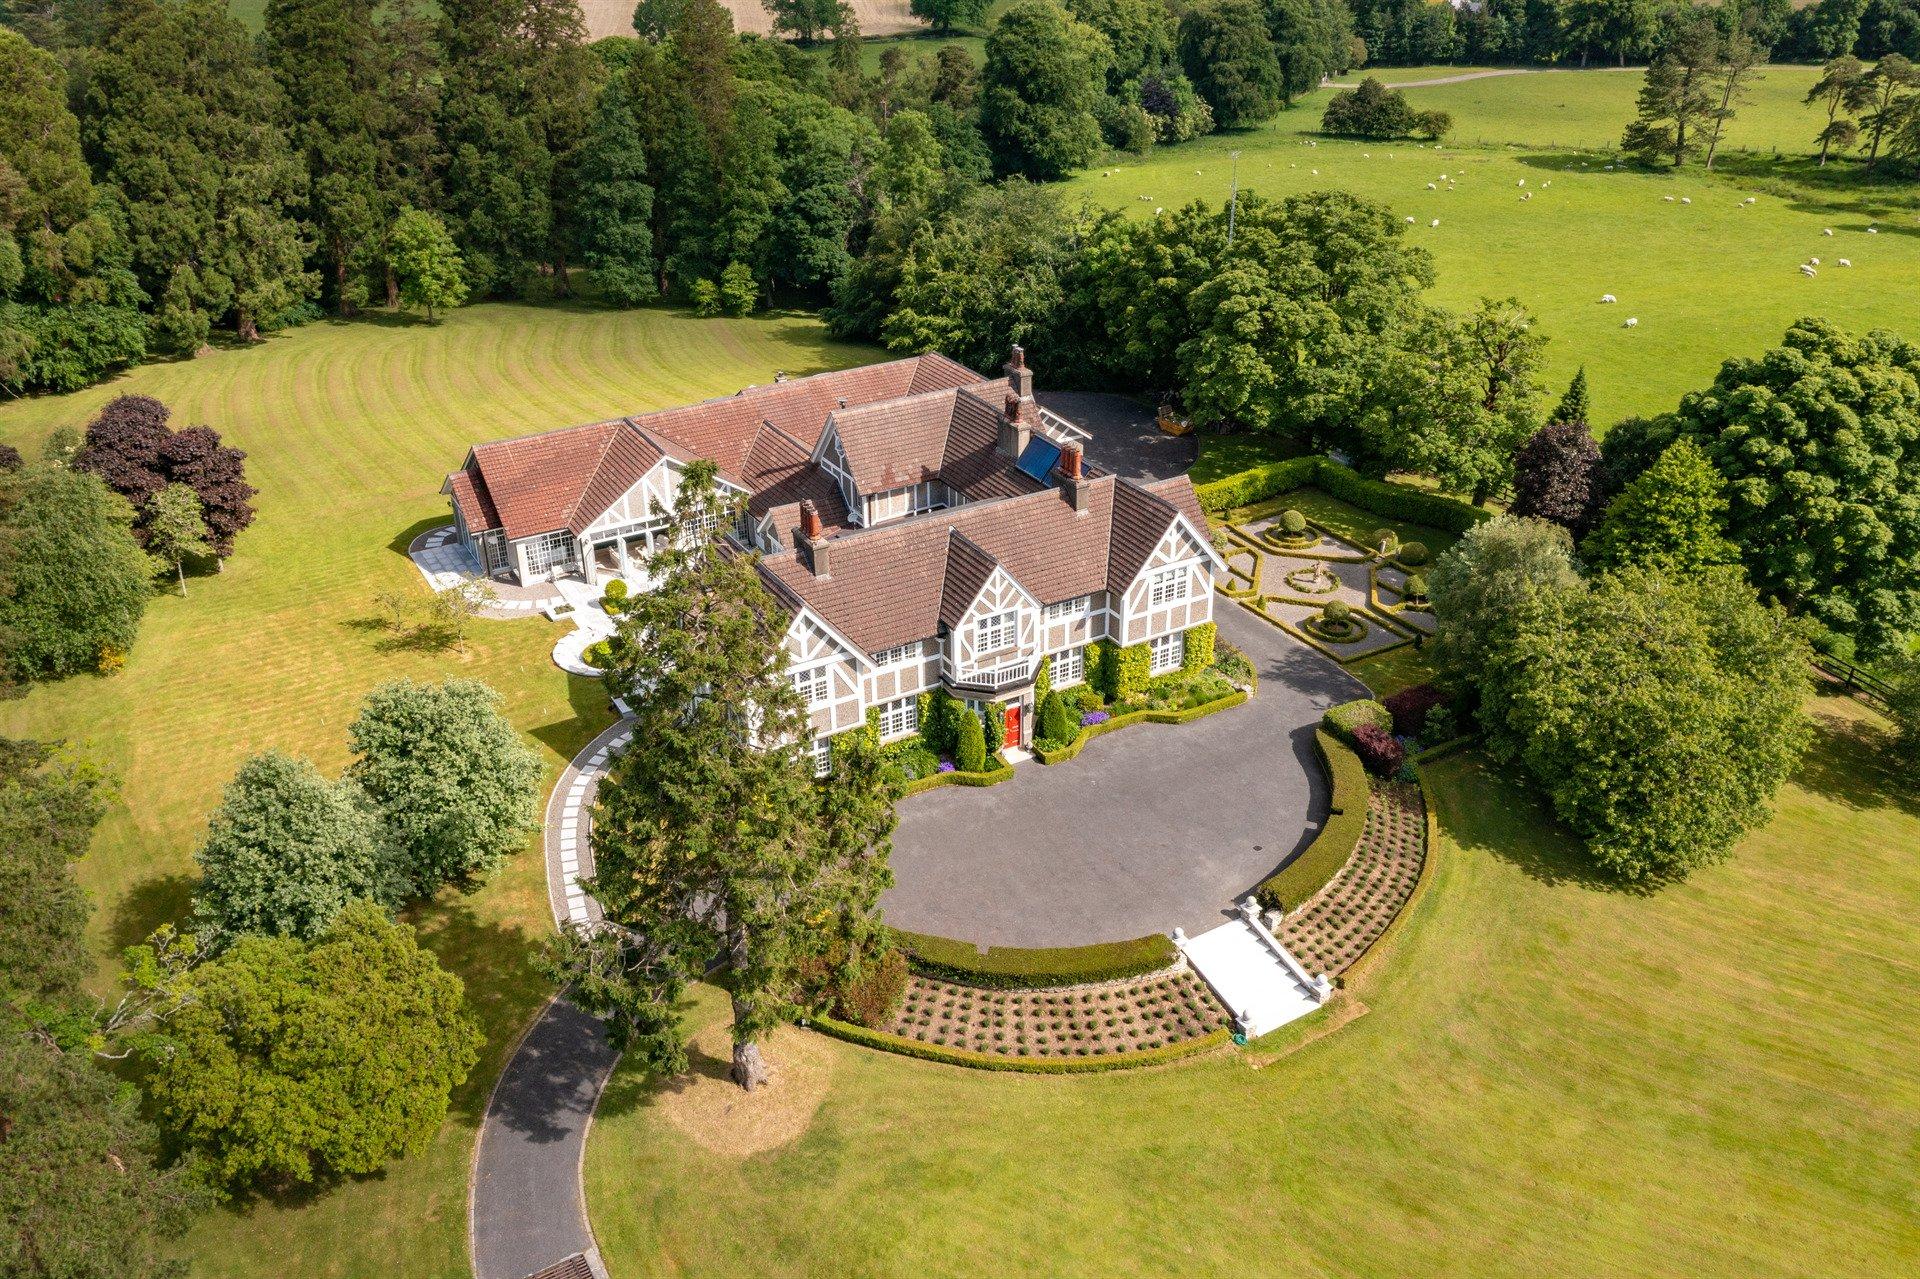 House in Rathmore, County Kildare, Ireland 1 - 11517902